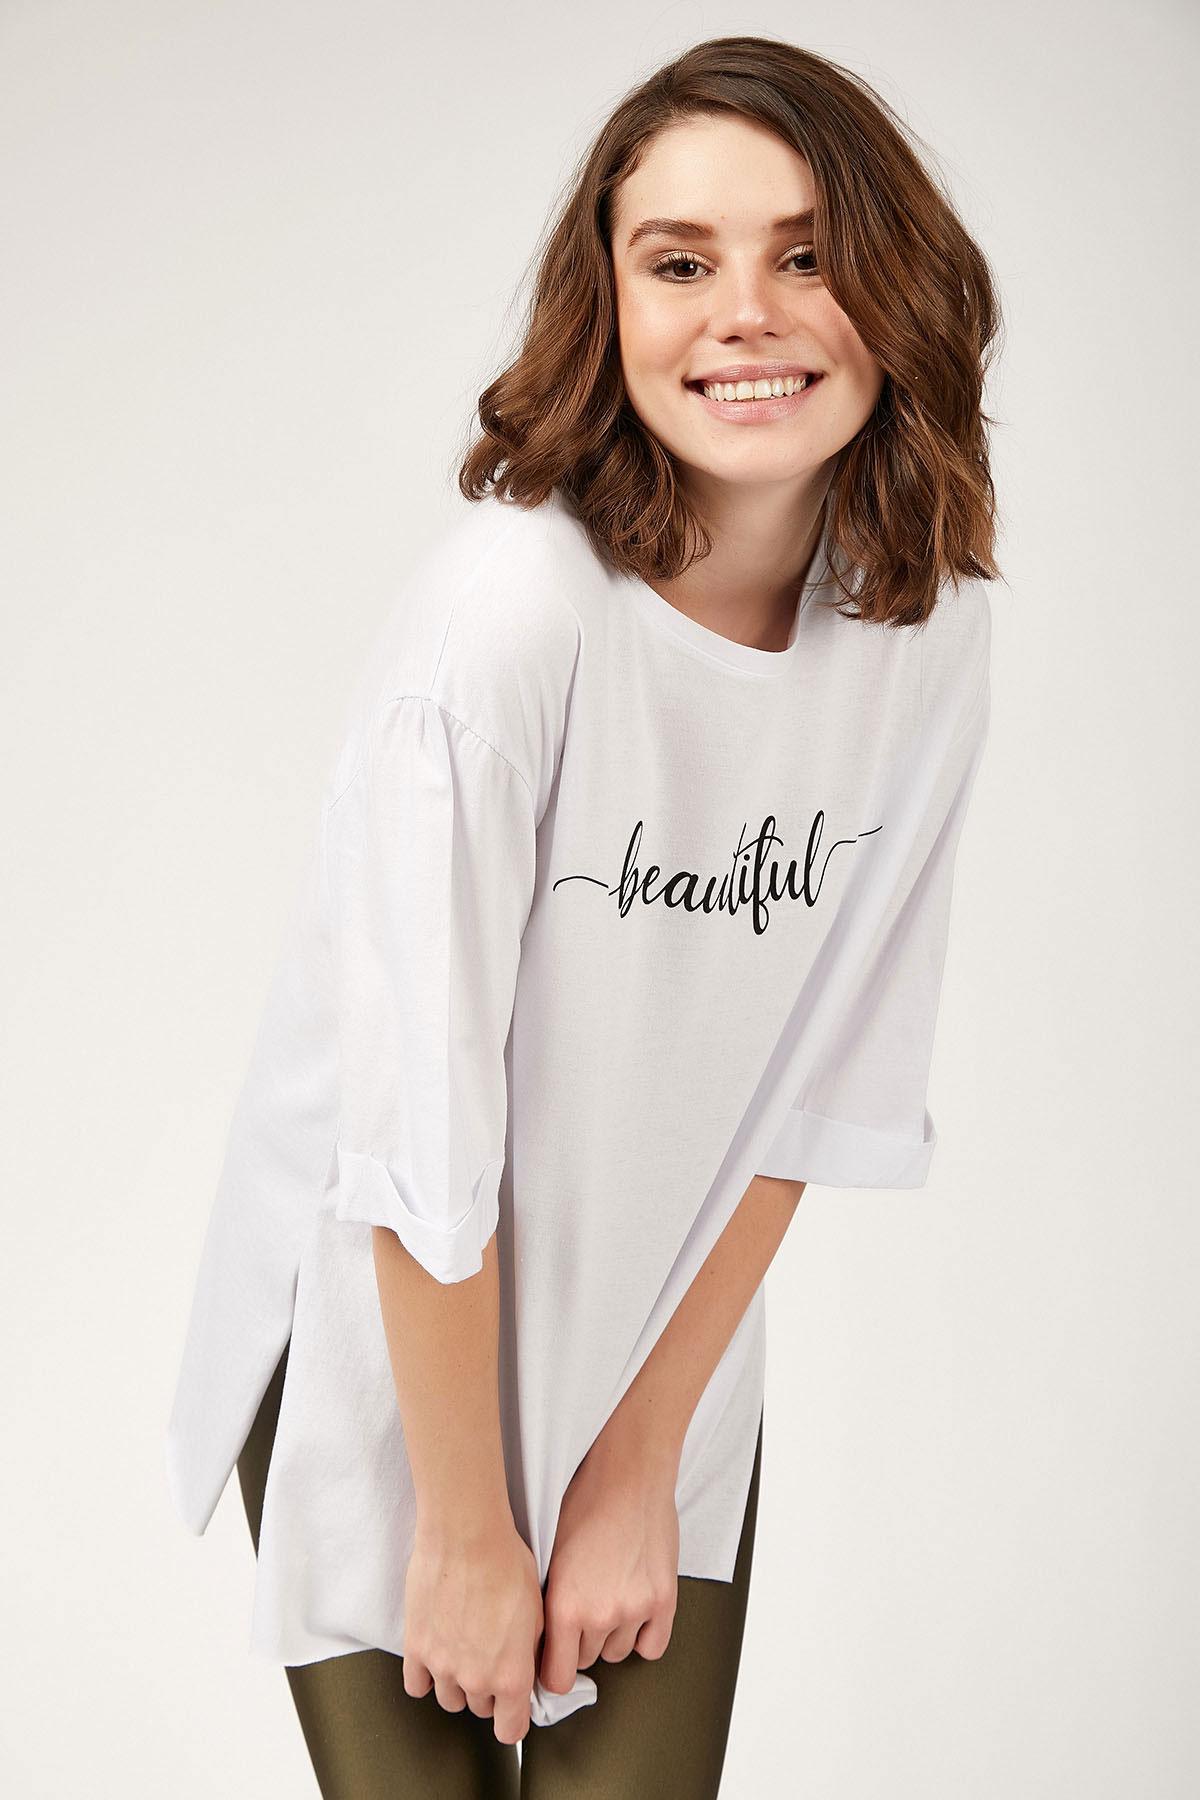 Women's Text Print White T-shirt